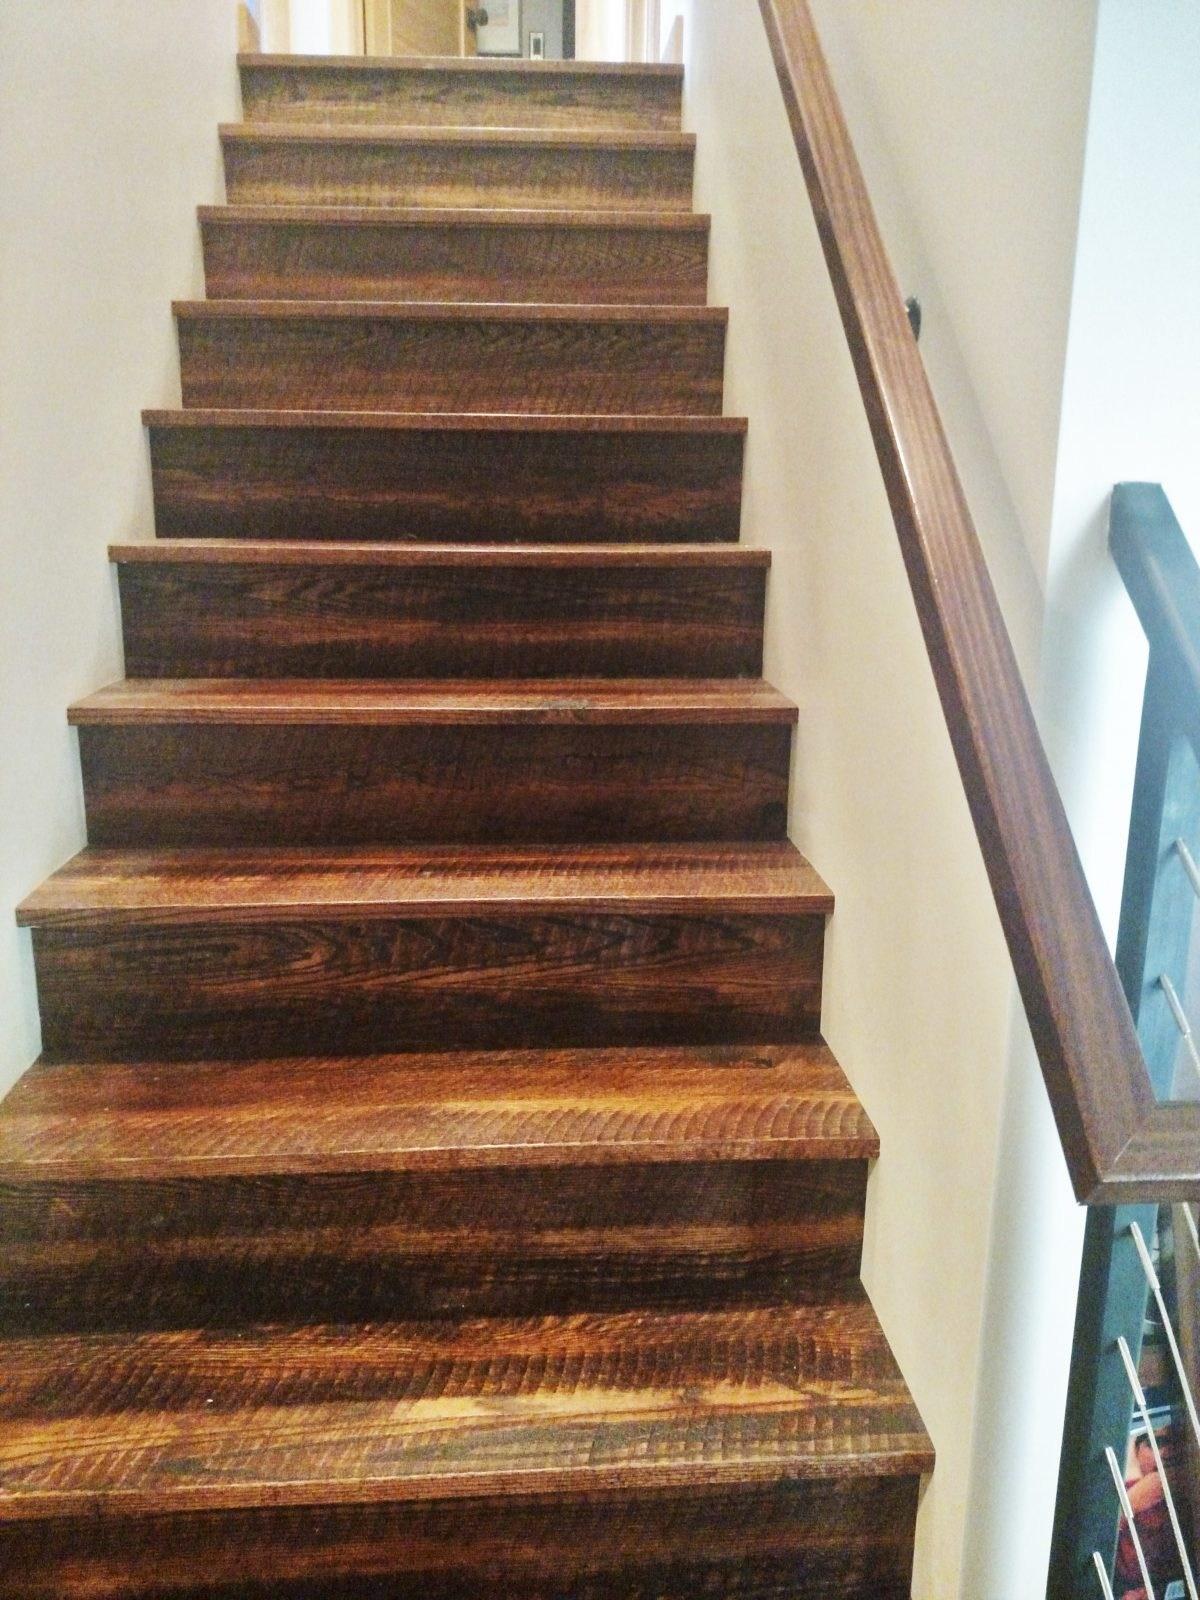 Rustic Red Oak Stair Treads And Risers – Bingham Lumber | Red Oak Stair Treads | Non Slip | Bullnose Manufacturing | Modern | Dark Stain | Wood